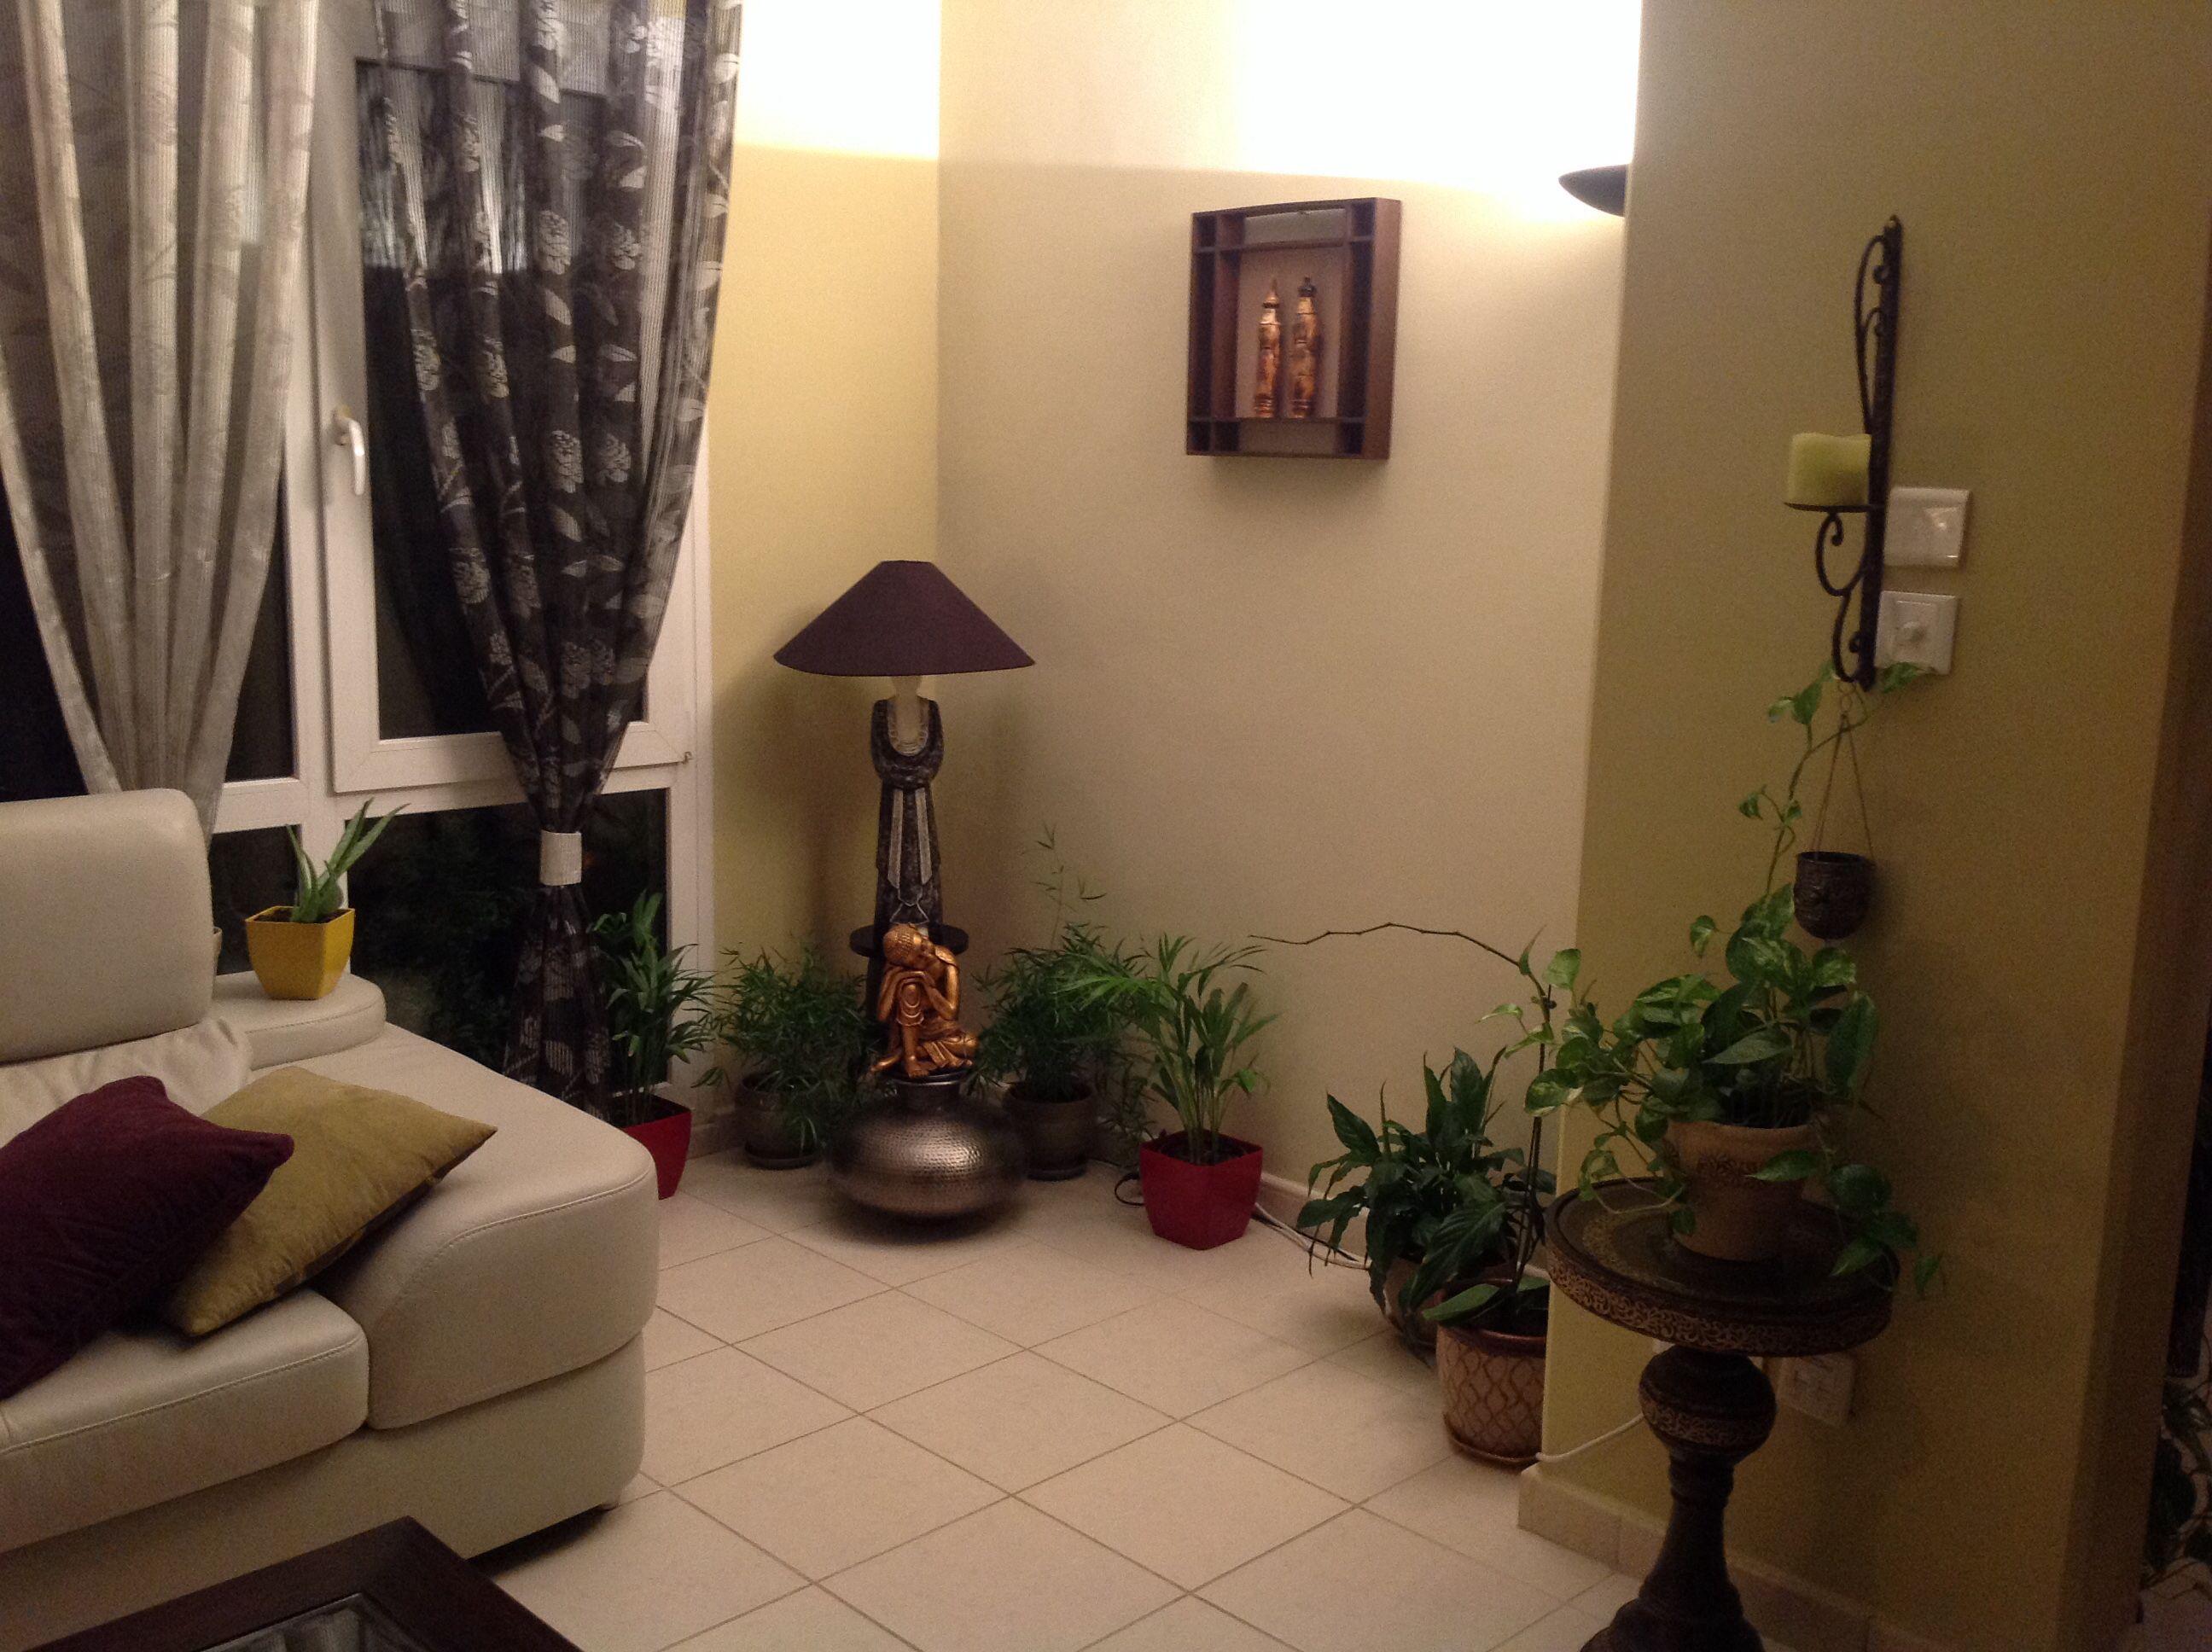 Corner Decor Love The Lamp Corner Decor Decor Diy Home Decor